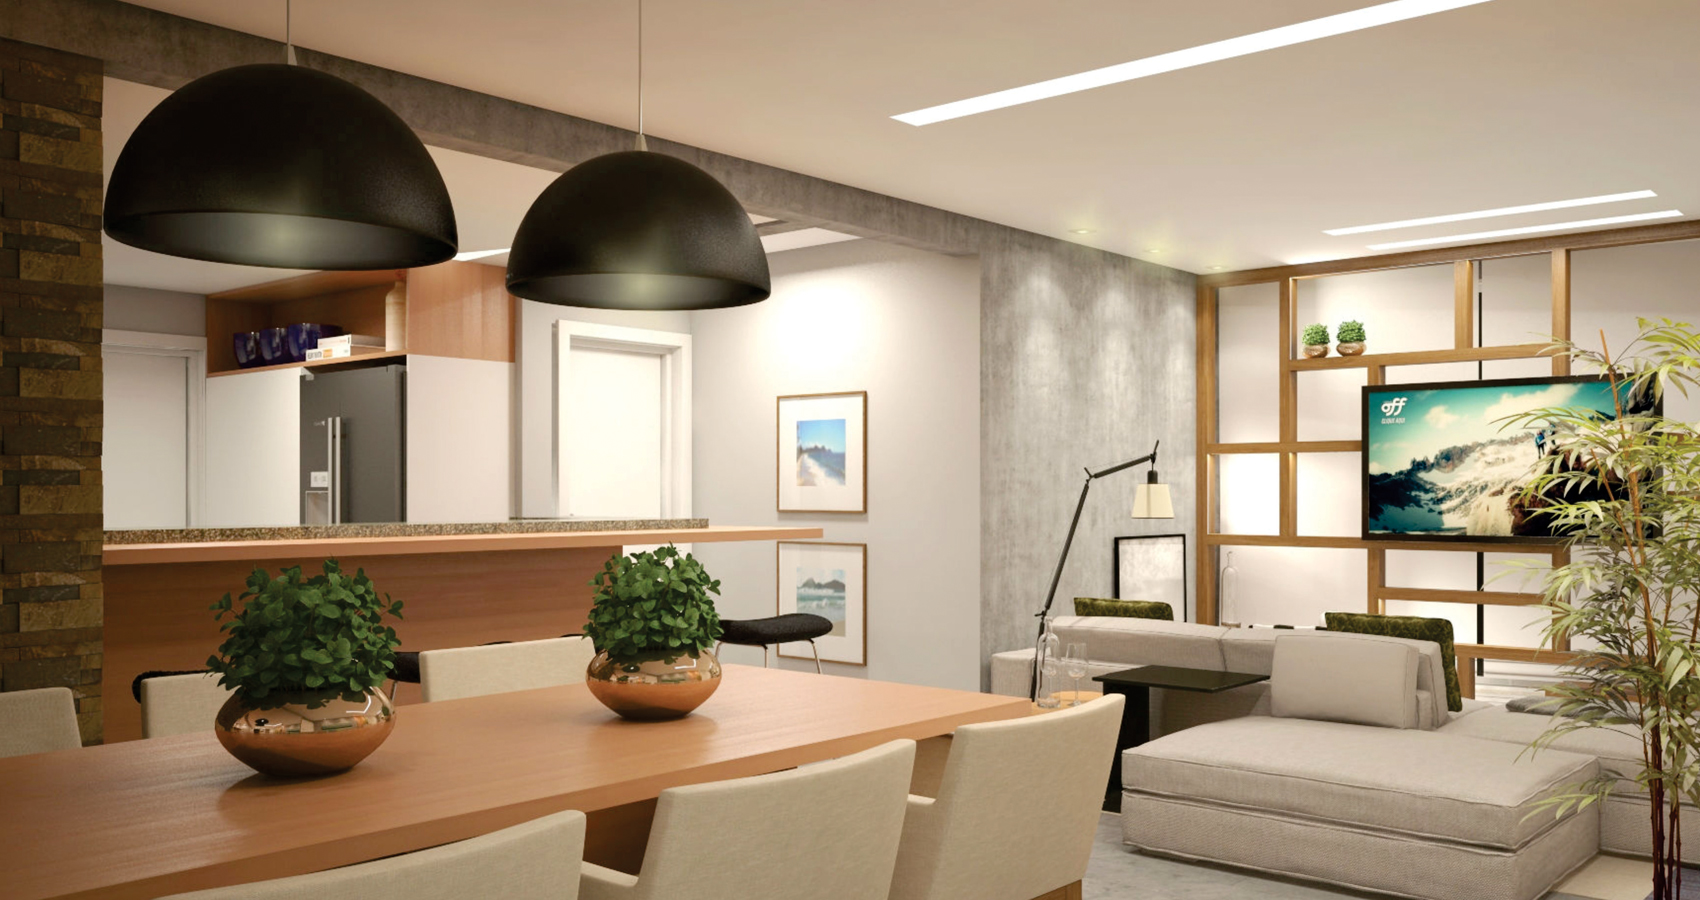 PJV Arquitetura - Apartamento de praia